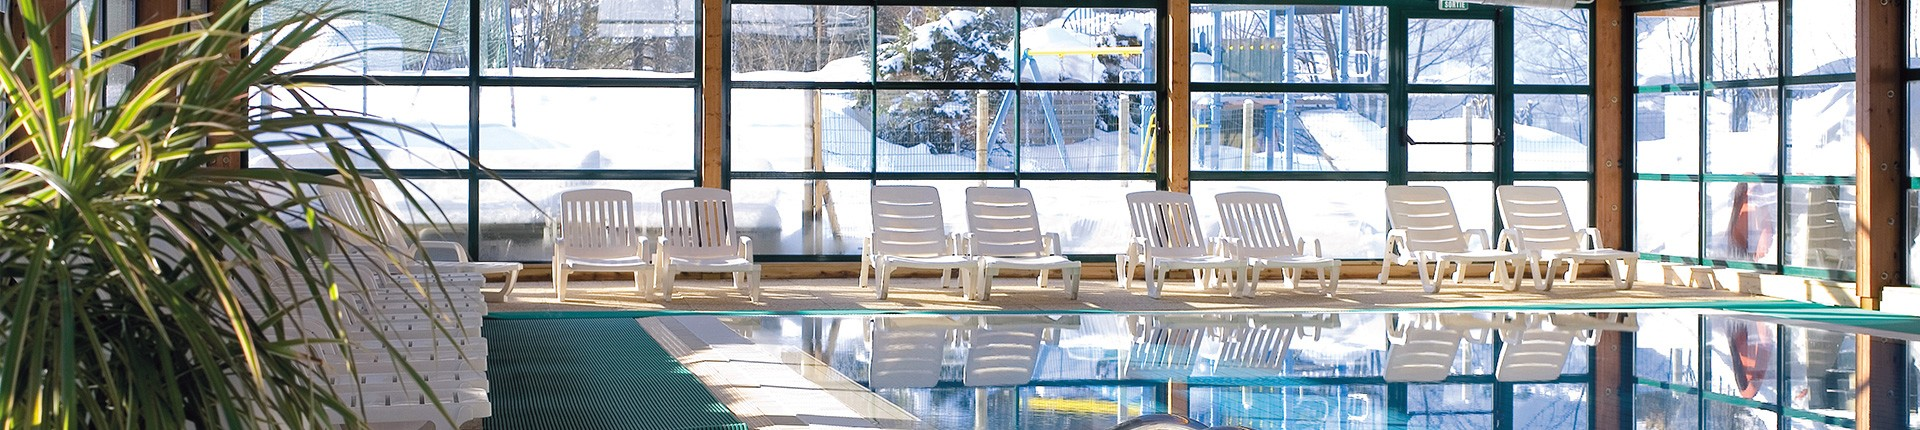 tetiere-piscine-hiver-12